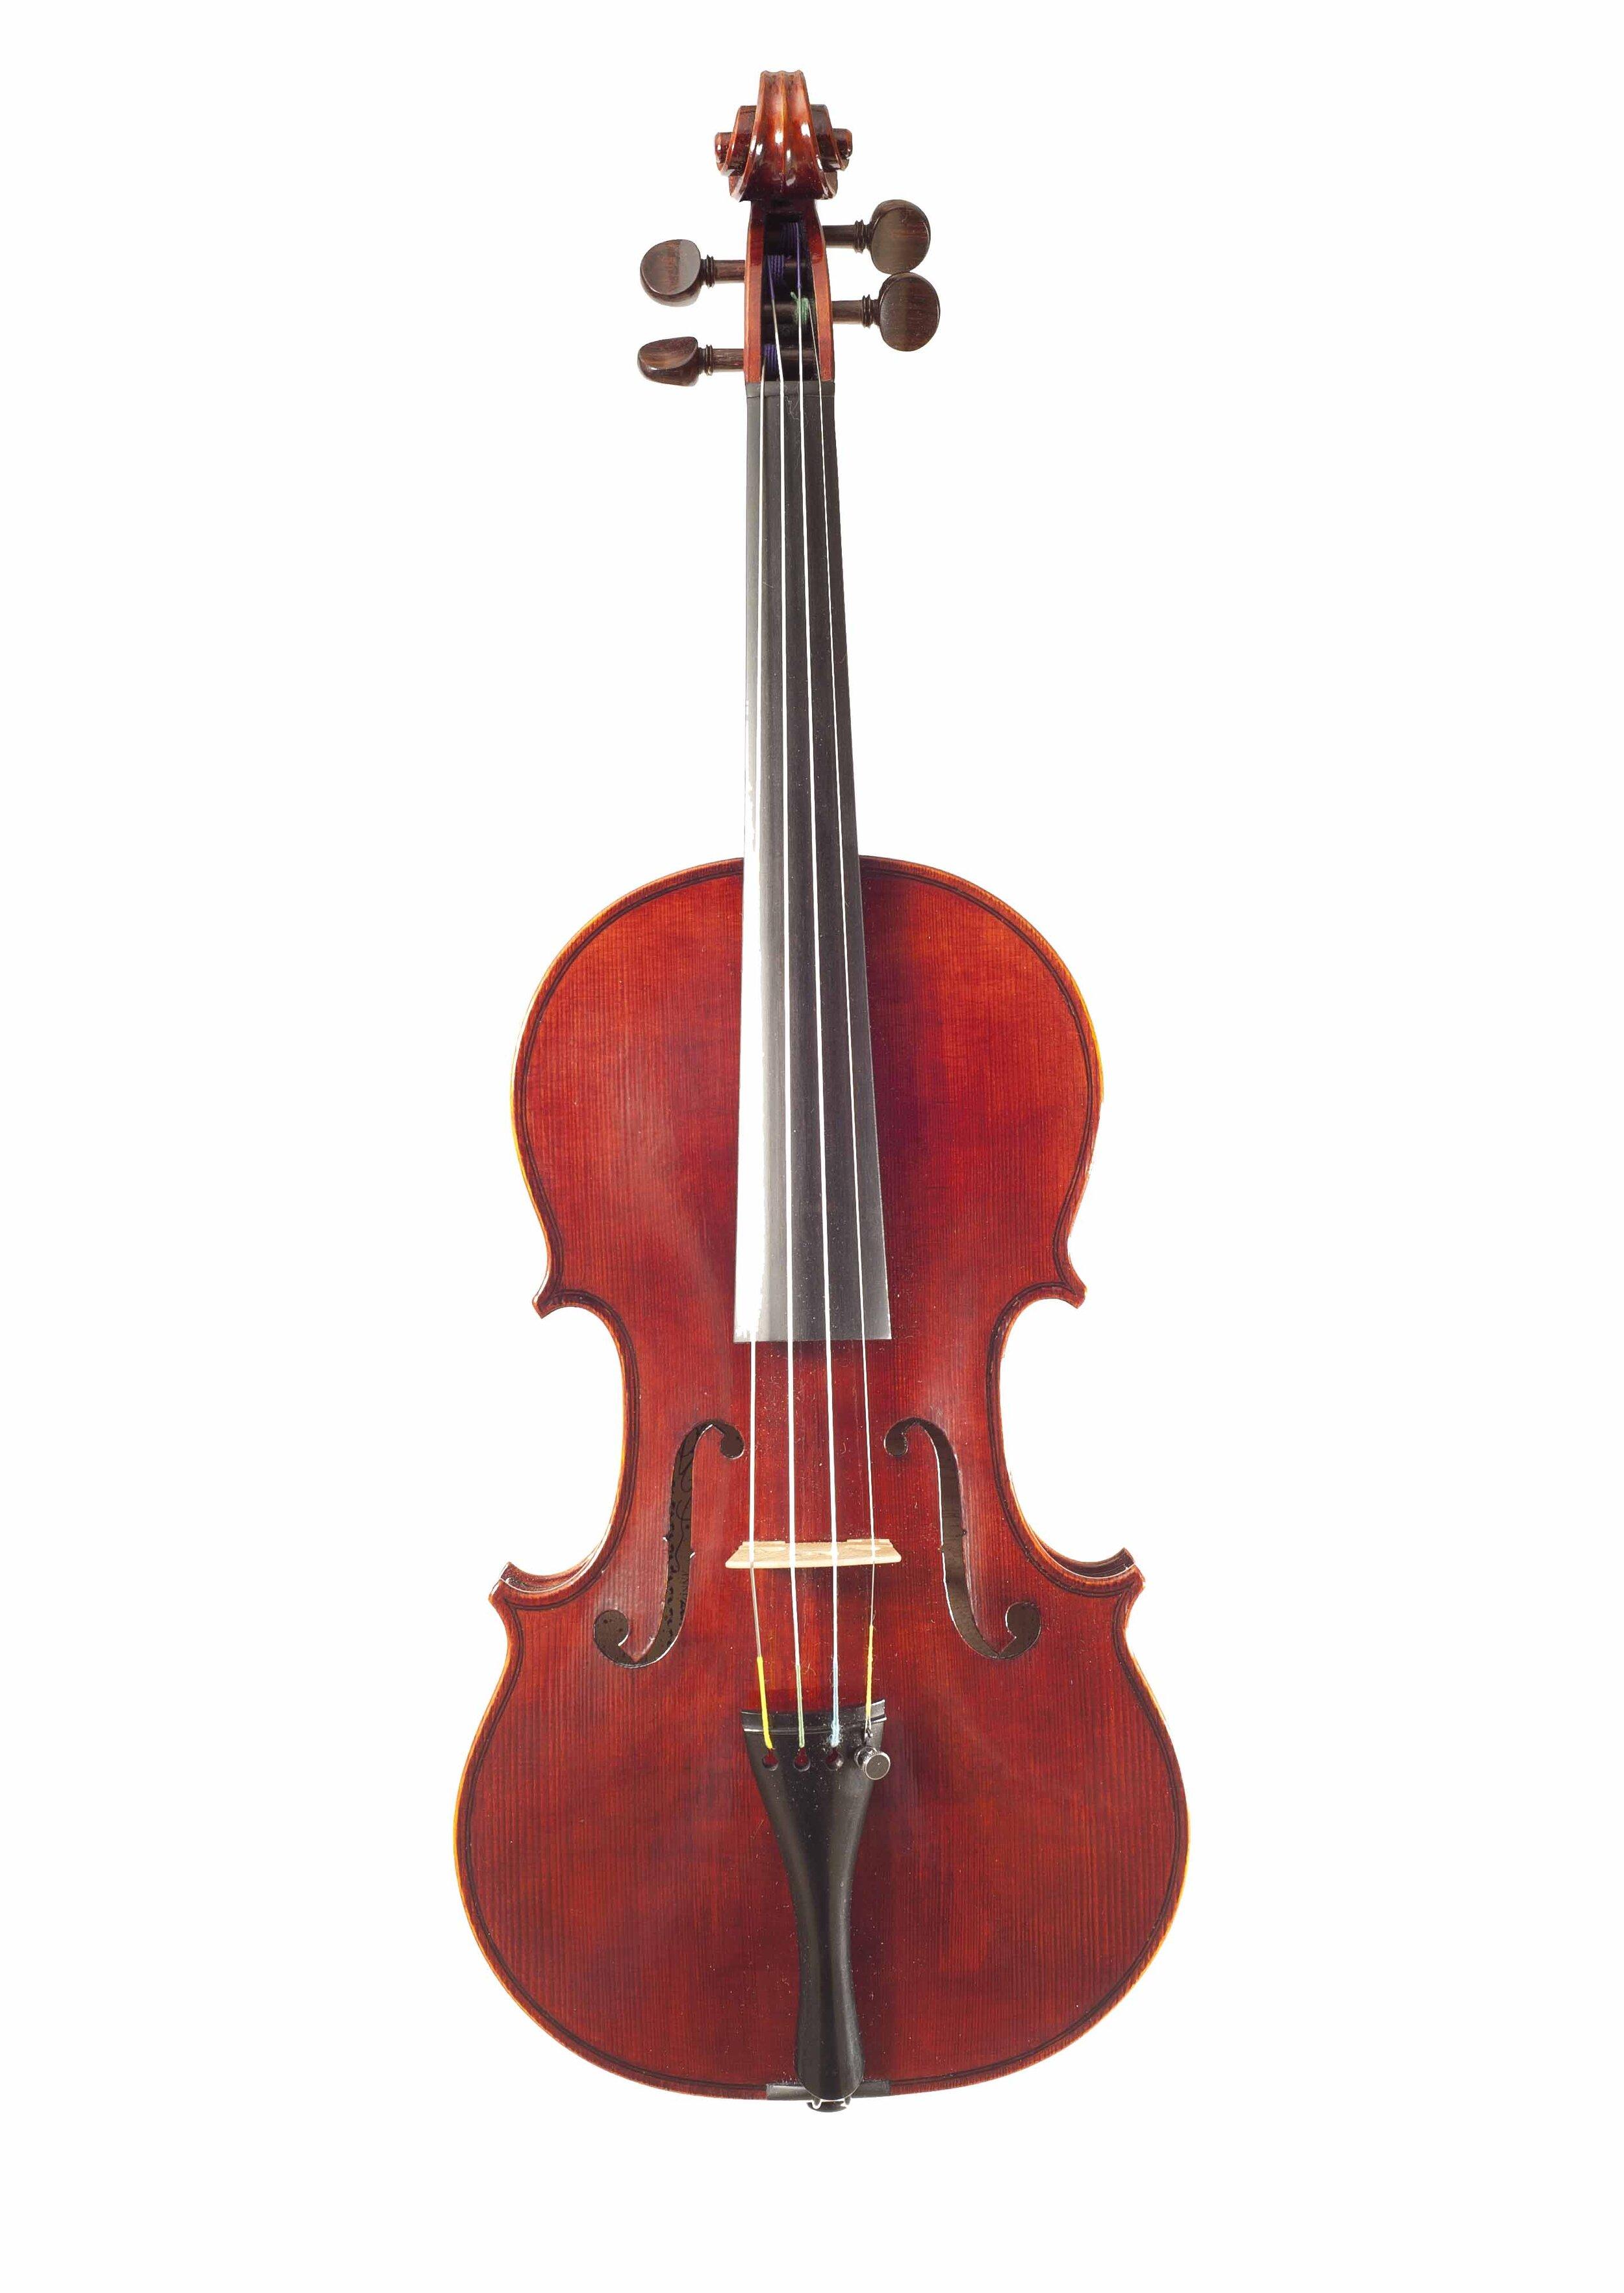 1 Strad Violin 'The Betts' 1704 Front.jpg